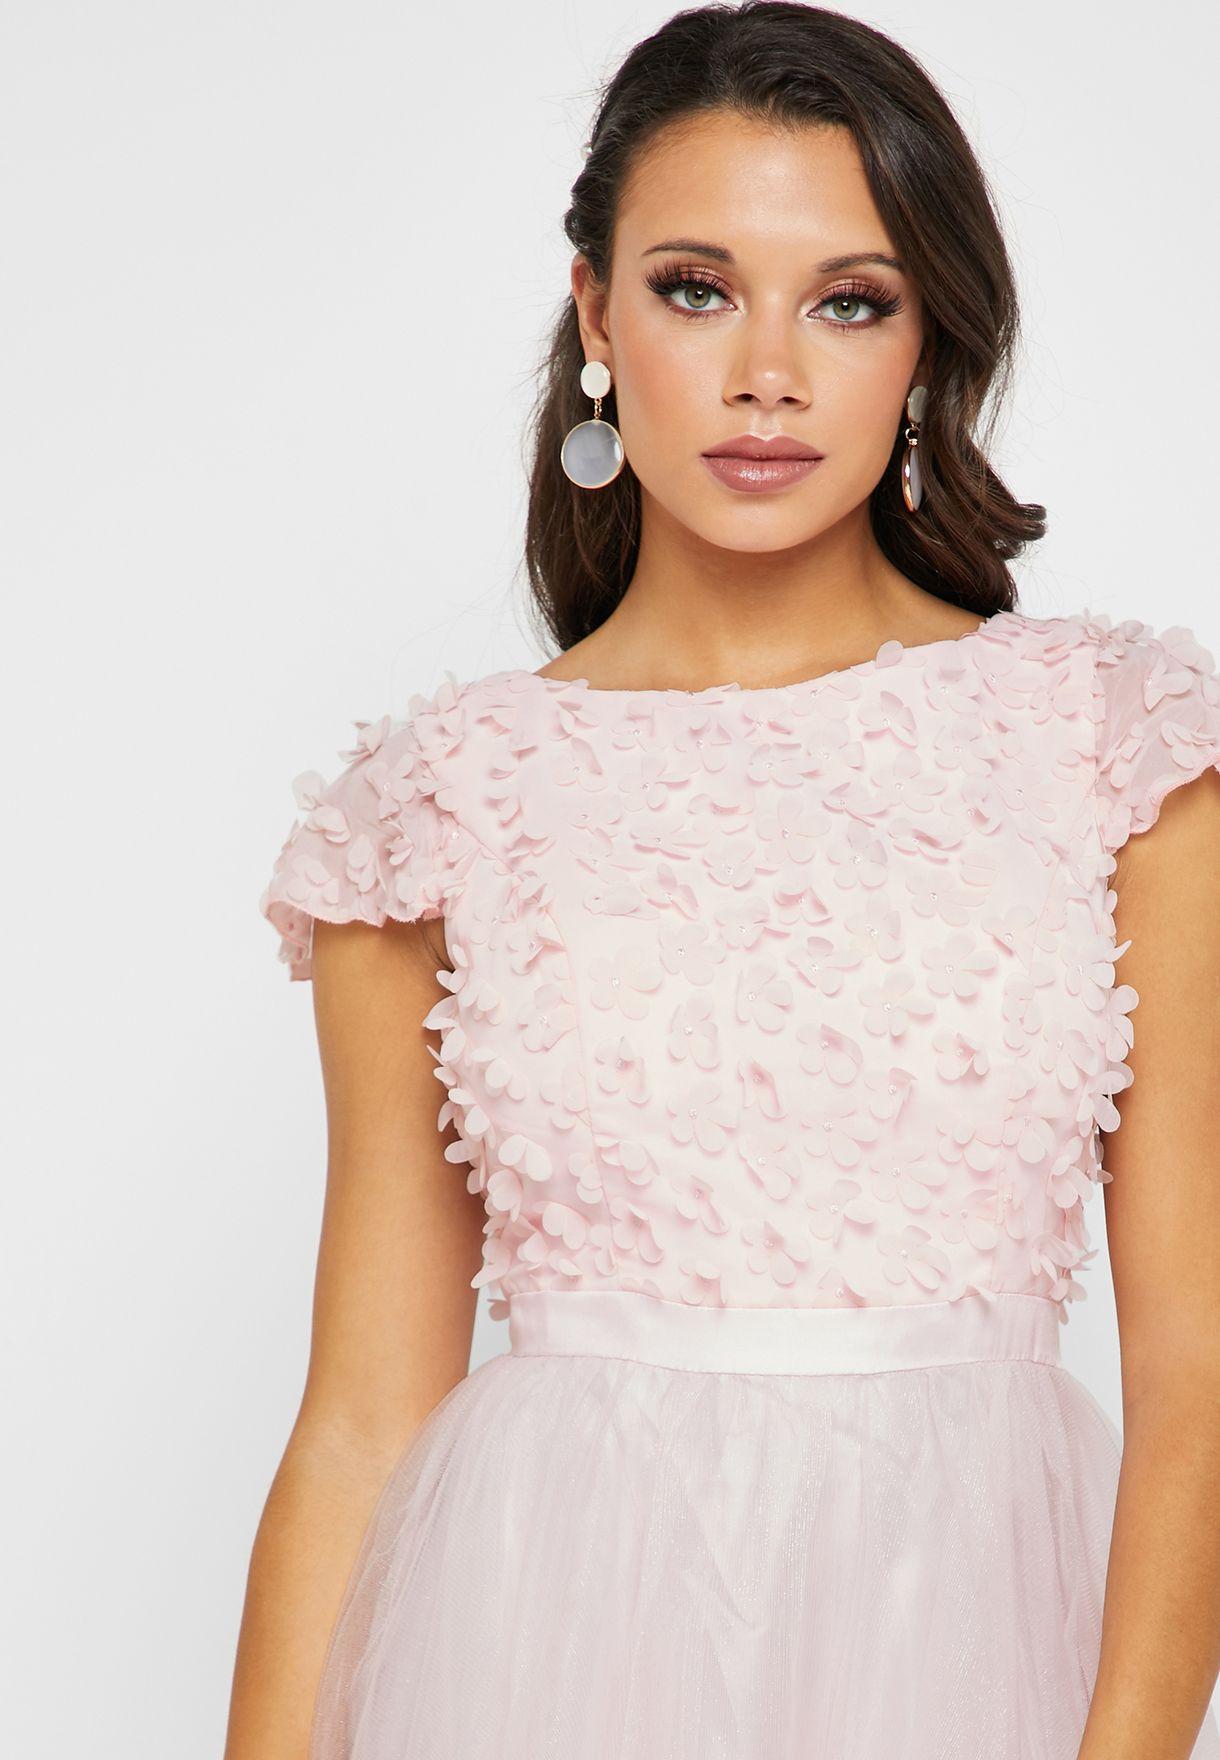 Tie Back Lace Top Dress